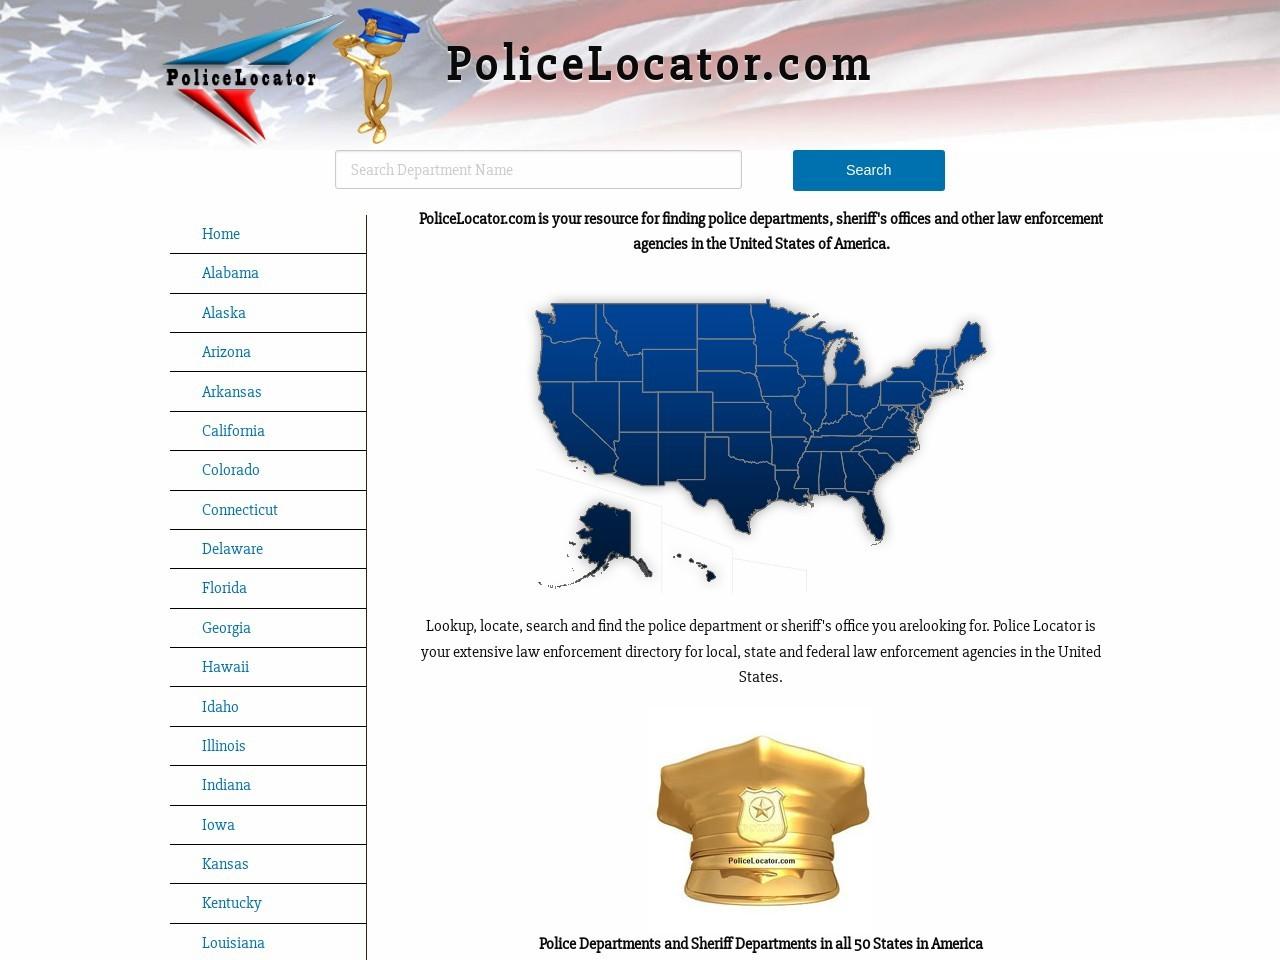 policelocator.com